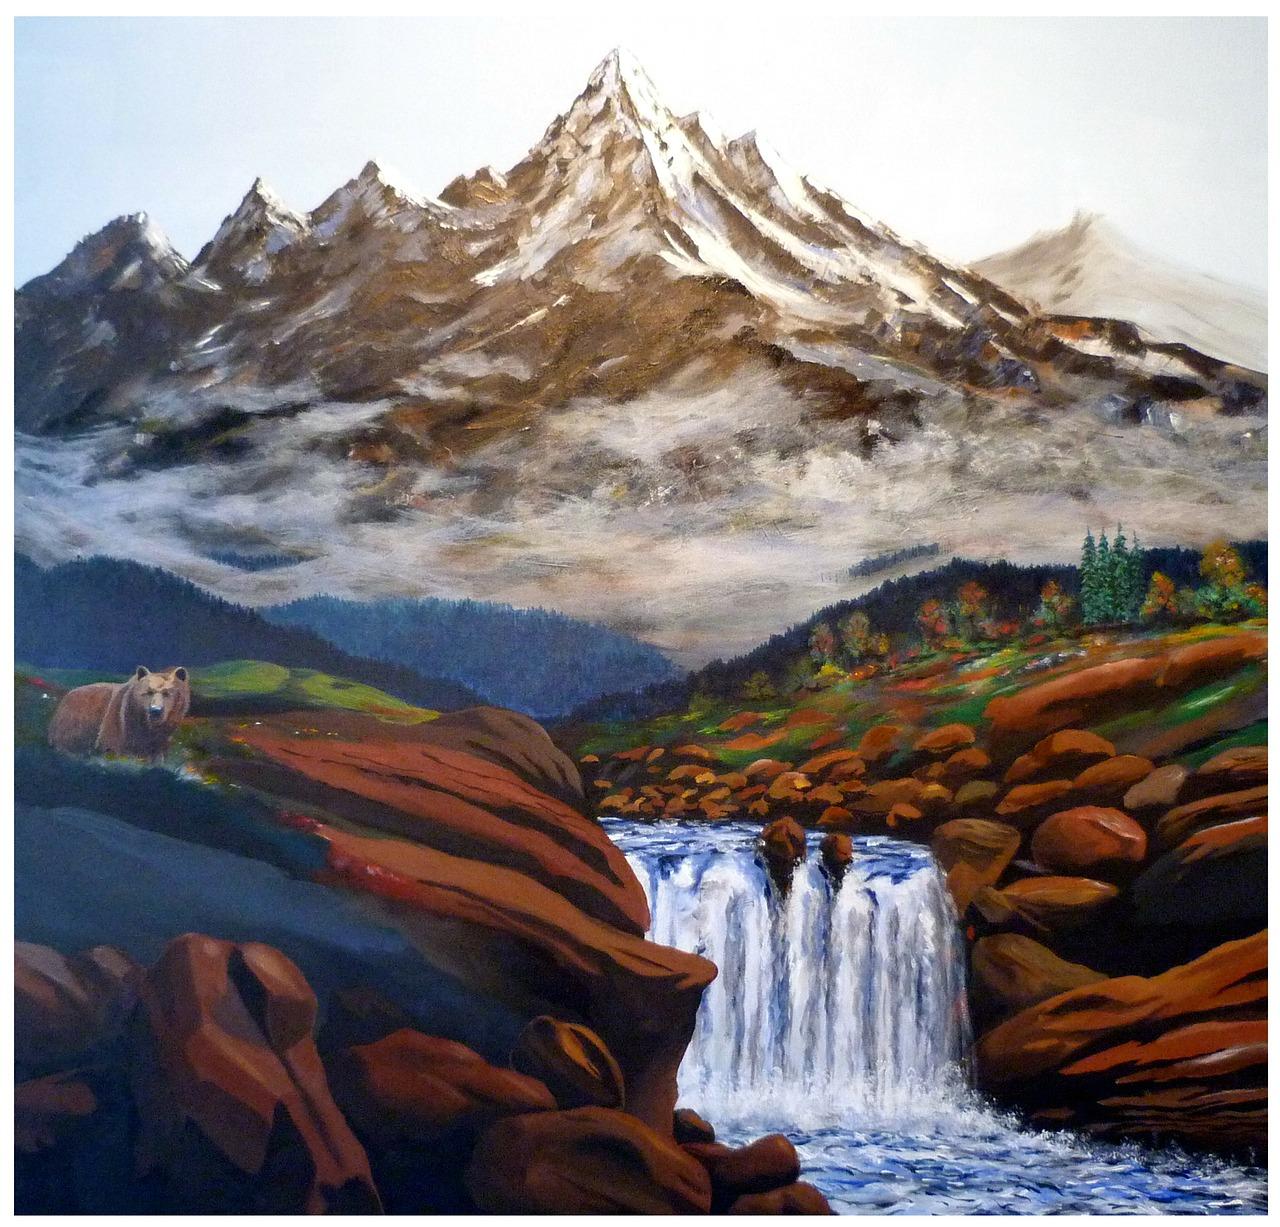 Lukisan Pemandangan Alam Indah Mirip Dengan Gambar Asli Hd Kabarduniaterbaru